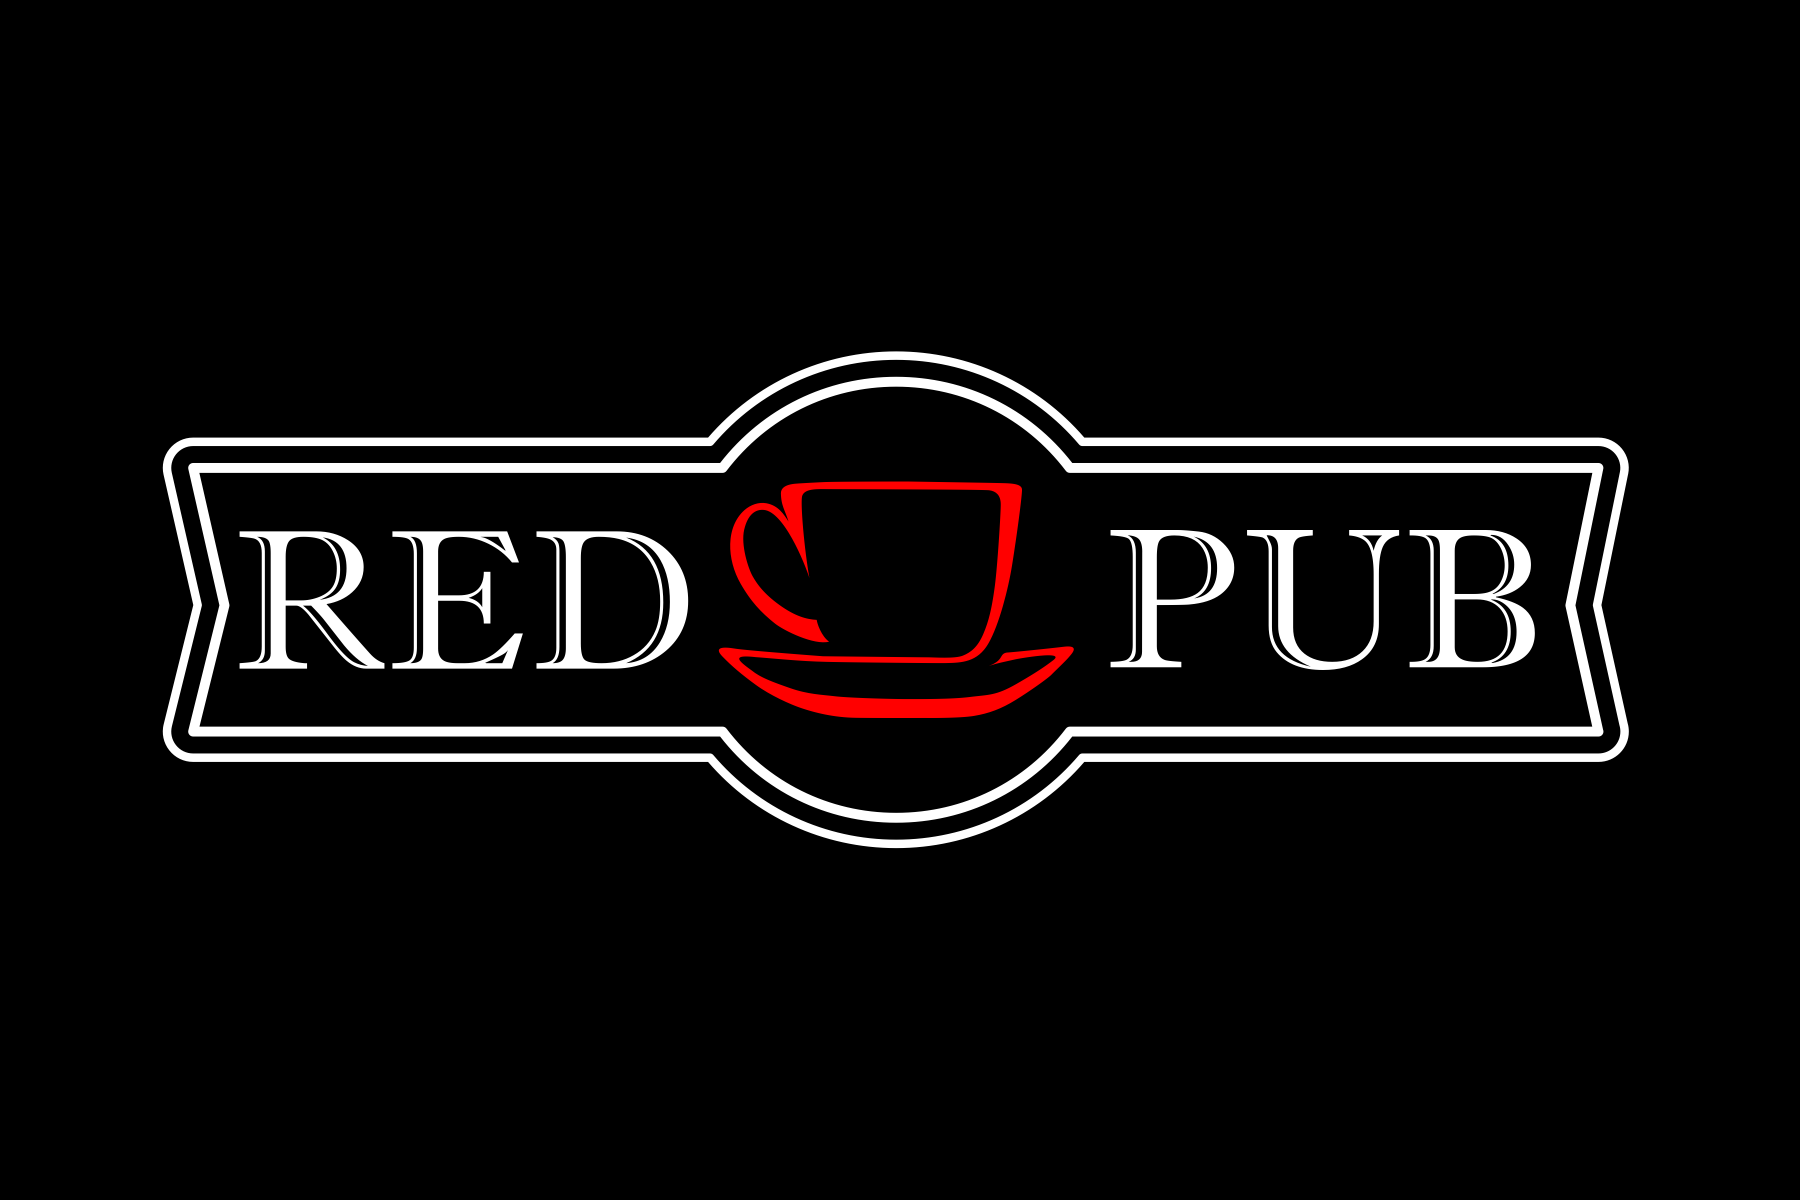 Red Cup Pub - темный фон